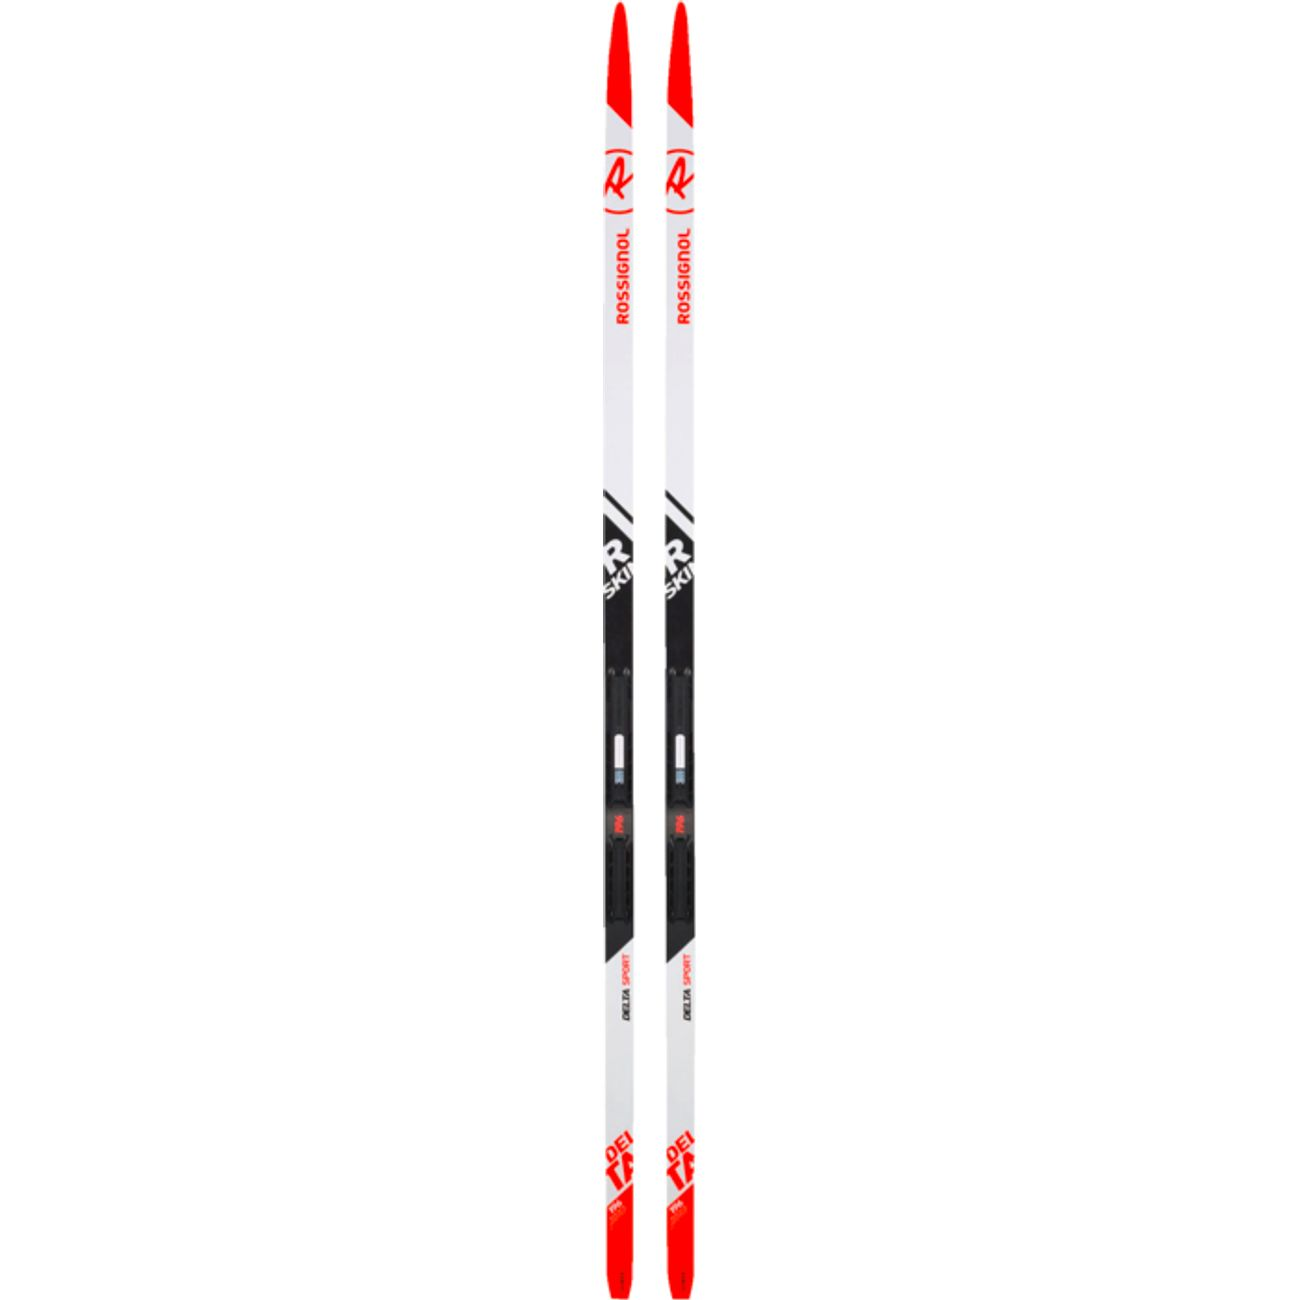 SKIS Ski junior ROSSIGNOL DELTA SPORT R-SKIN IFP + Fixation RACE CLASSIC